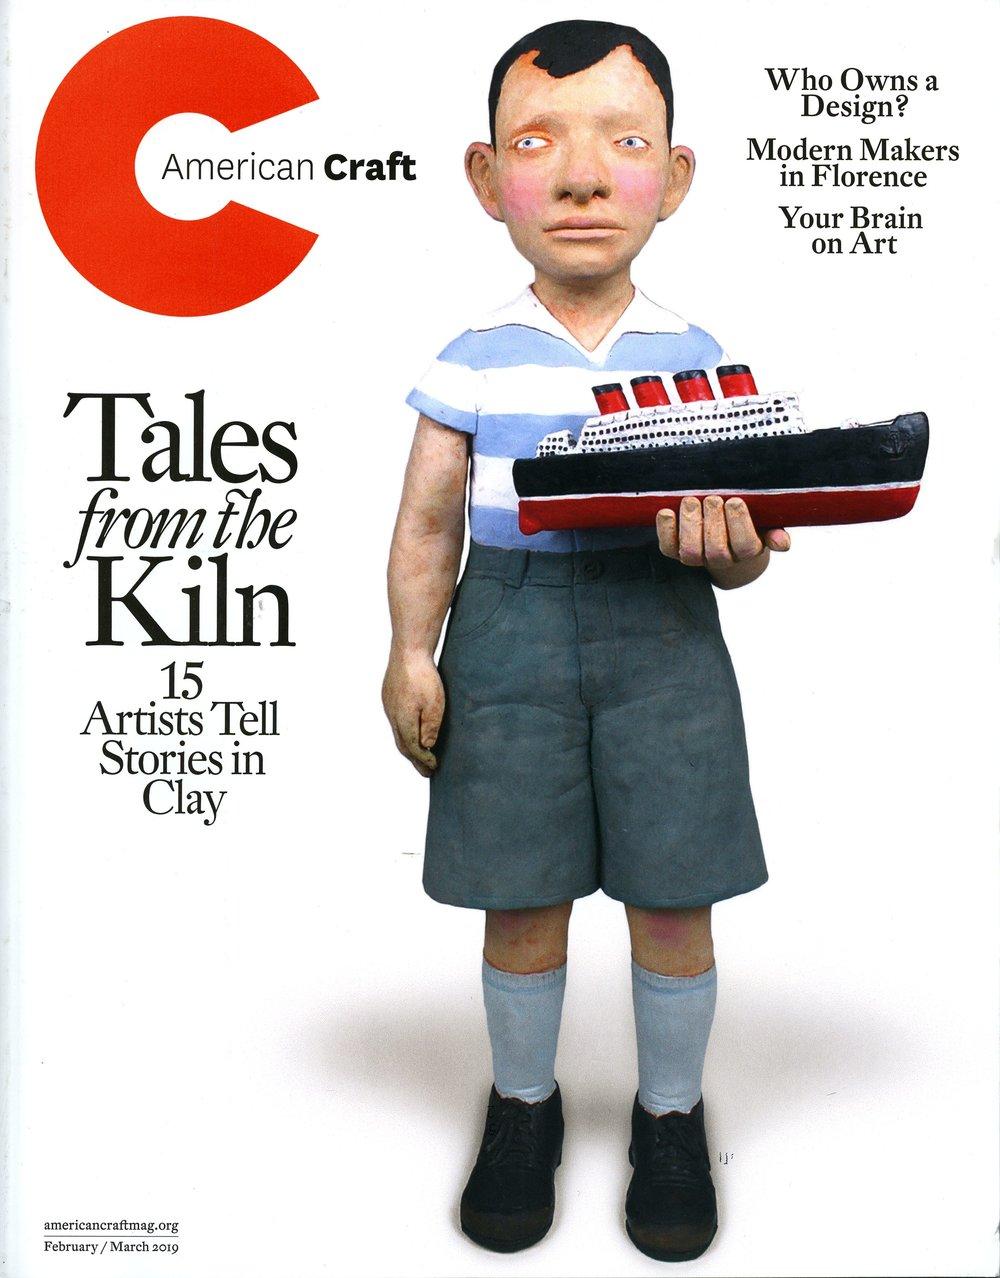 American Craft 1.jpg